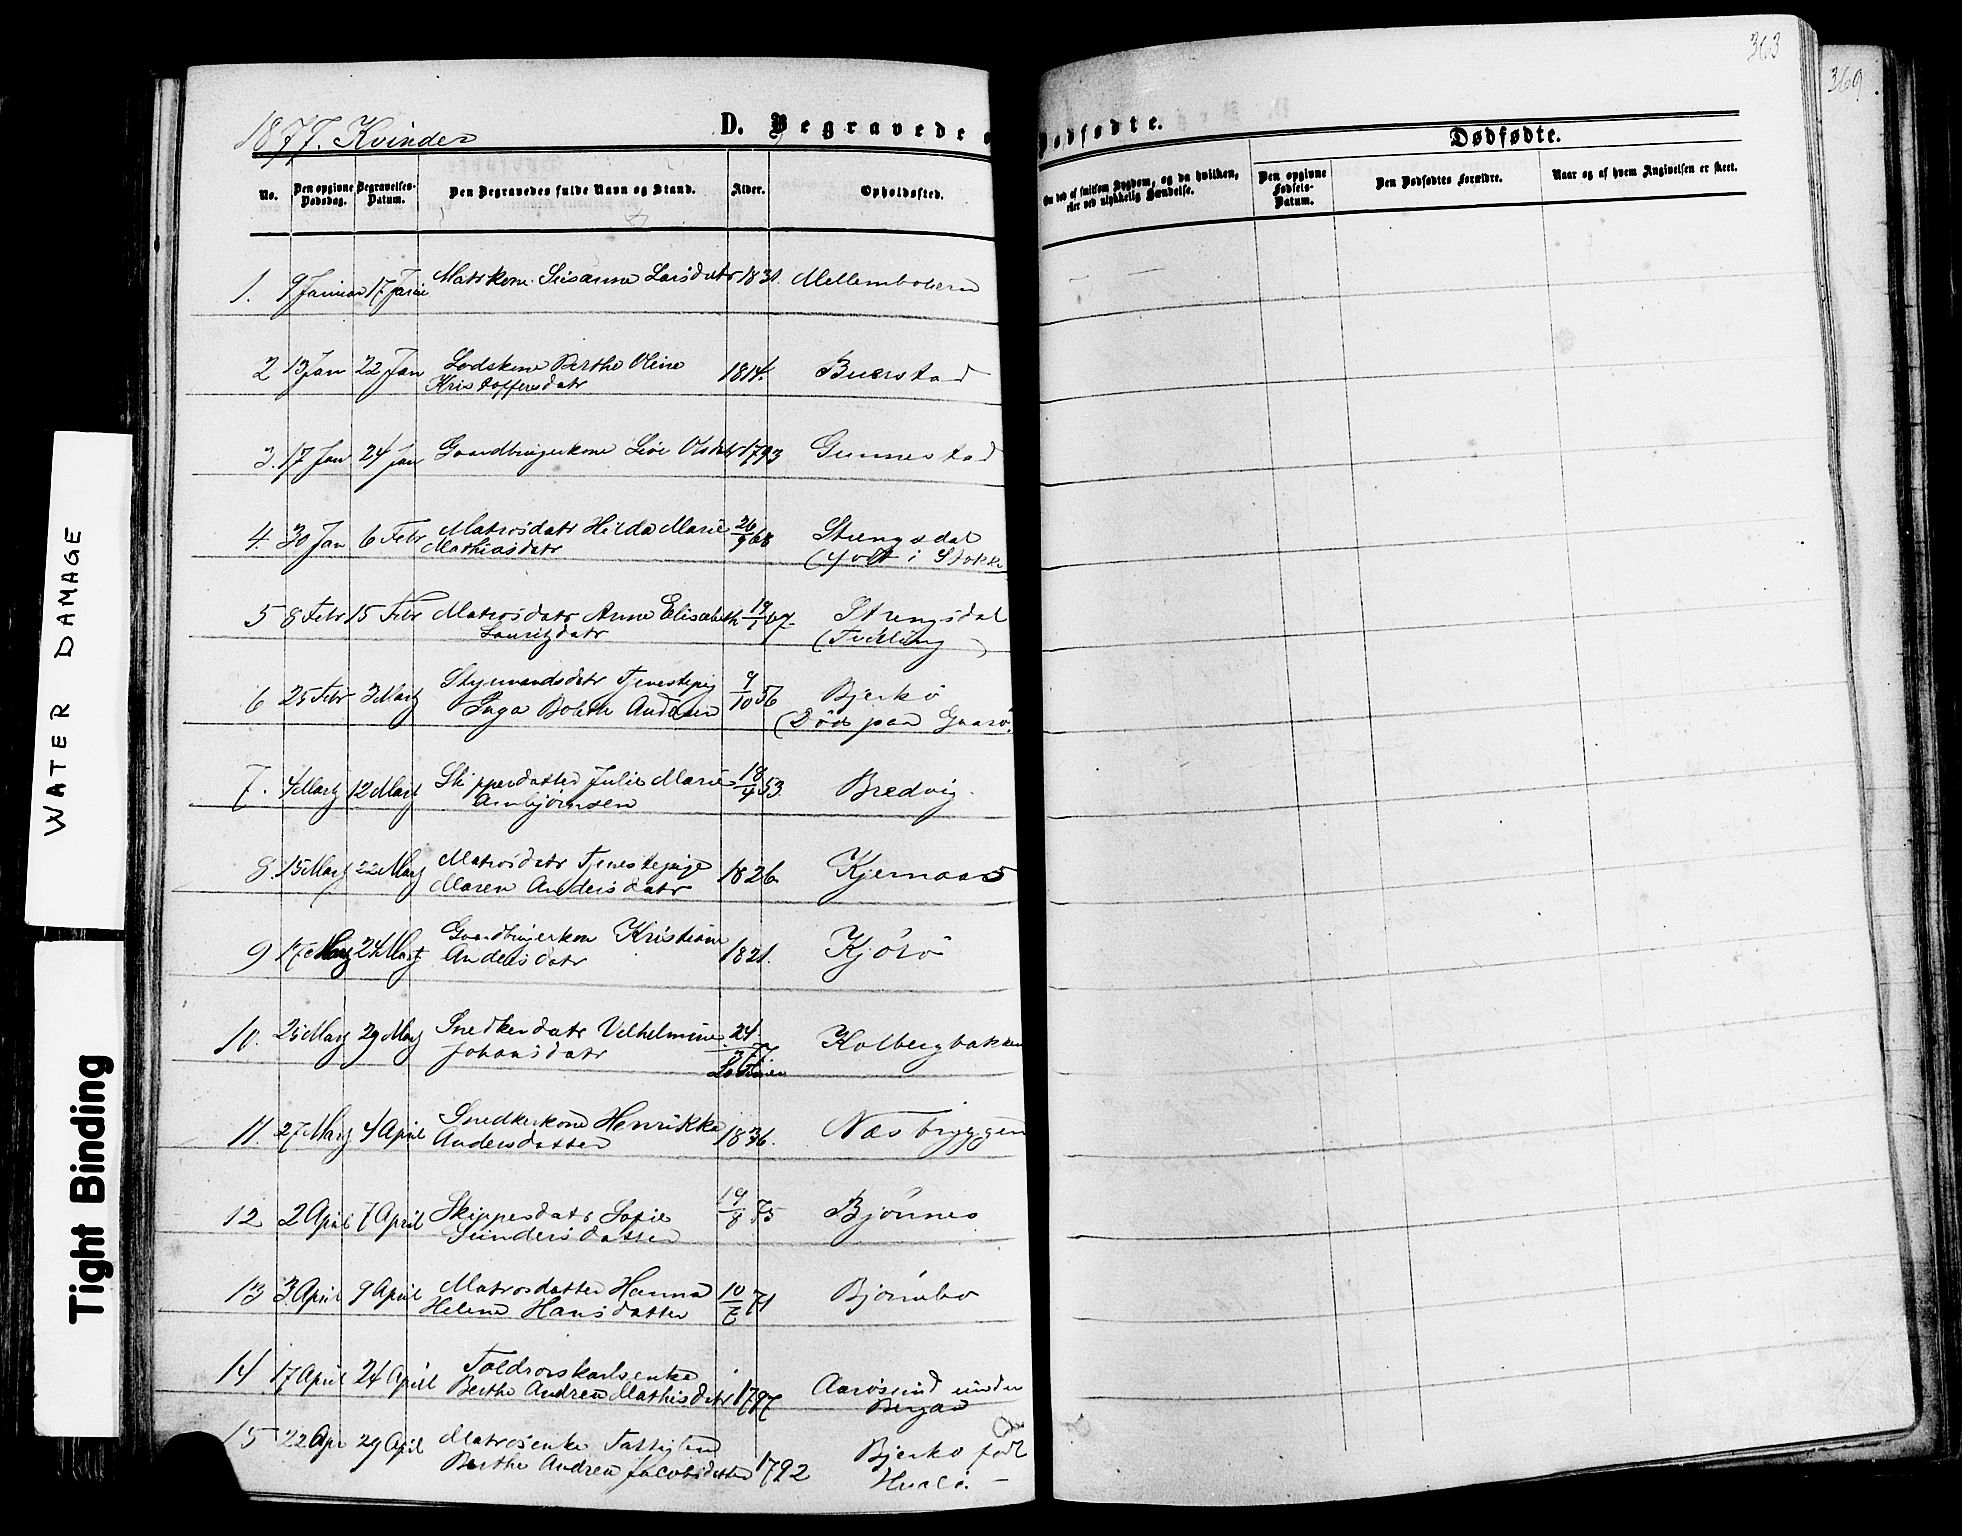 SAKO, Nøtterøy kirkebøker, F/Fa/L0007: Ministerialbok nr. I 7, 1865-1877, s. 363